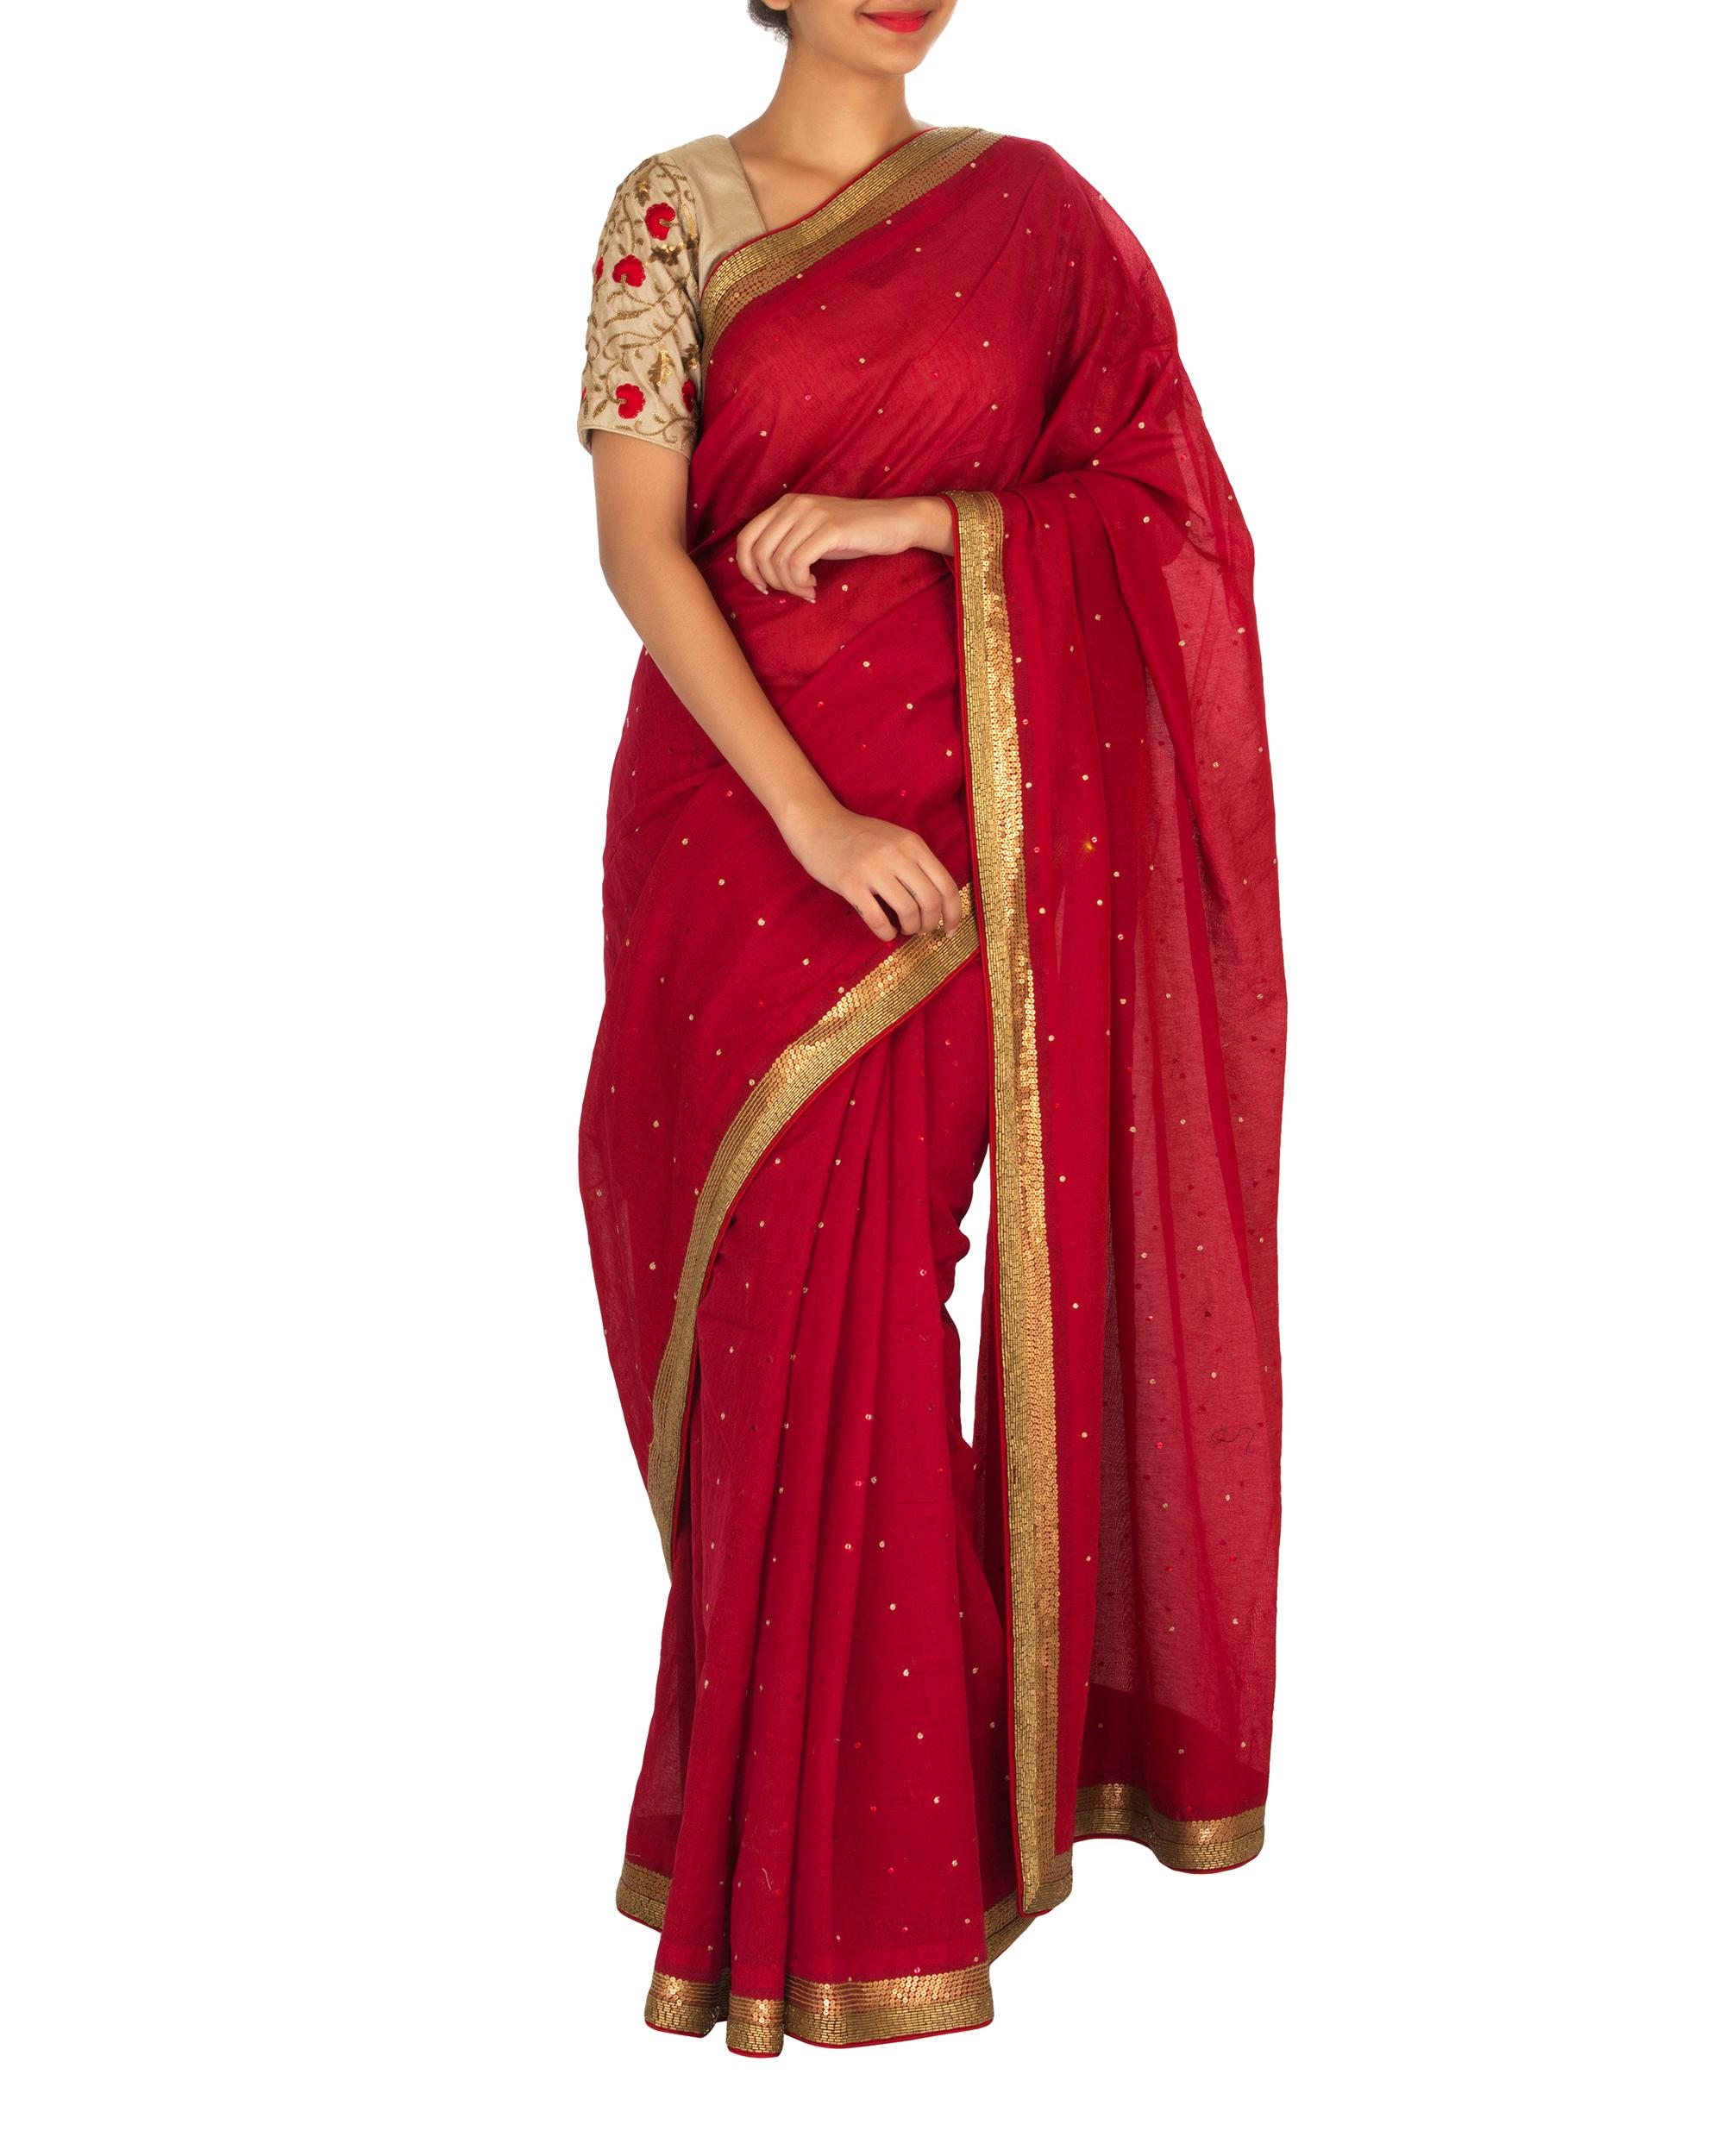 Red and beige chanderi sari